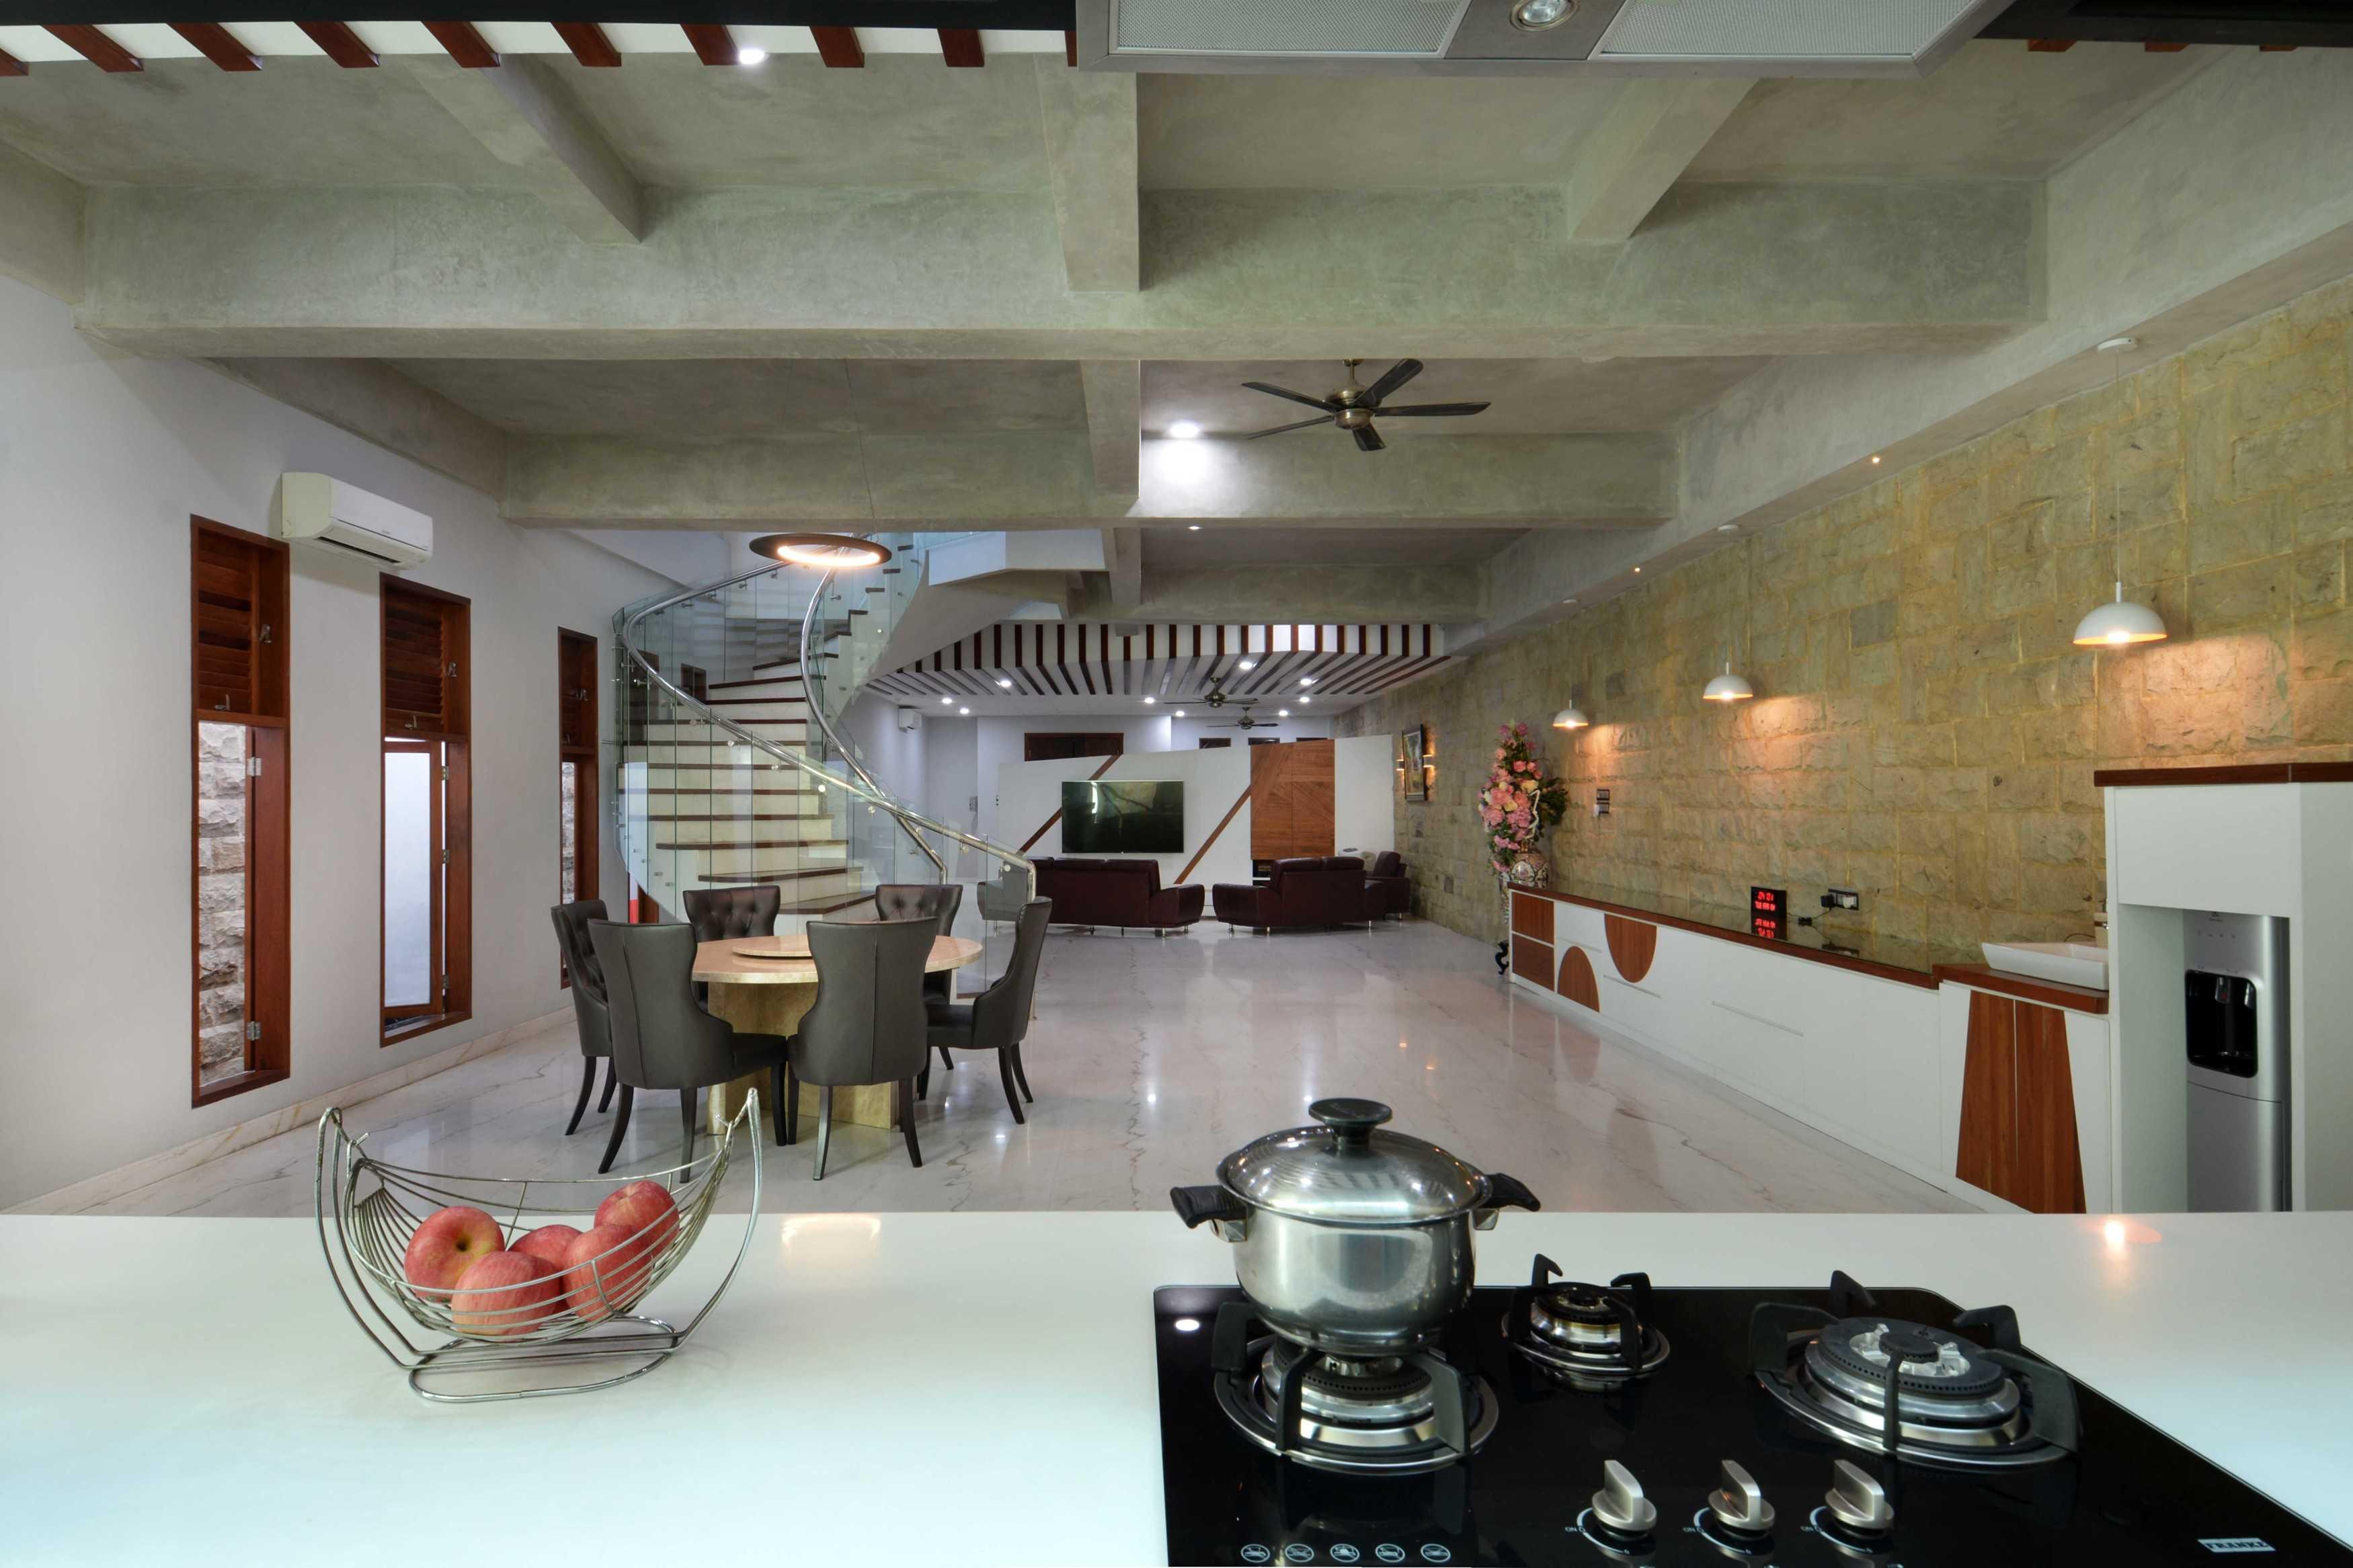 Merah Putih Architecture Re Born House Pulau Sumatera, Indonesia Pulau Sumatera, Indonesia Merah-Putih-Architecture-Re-Born-House   87699